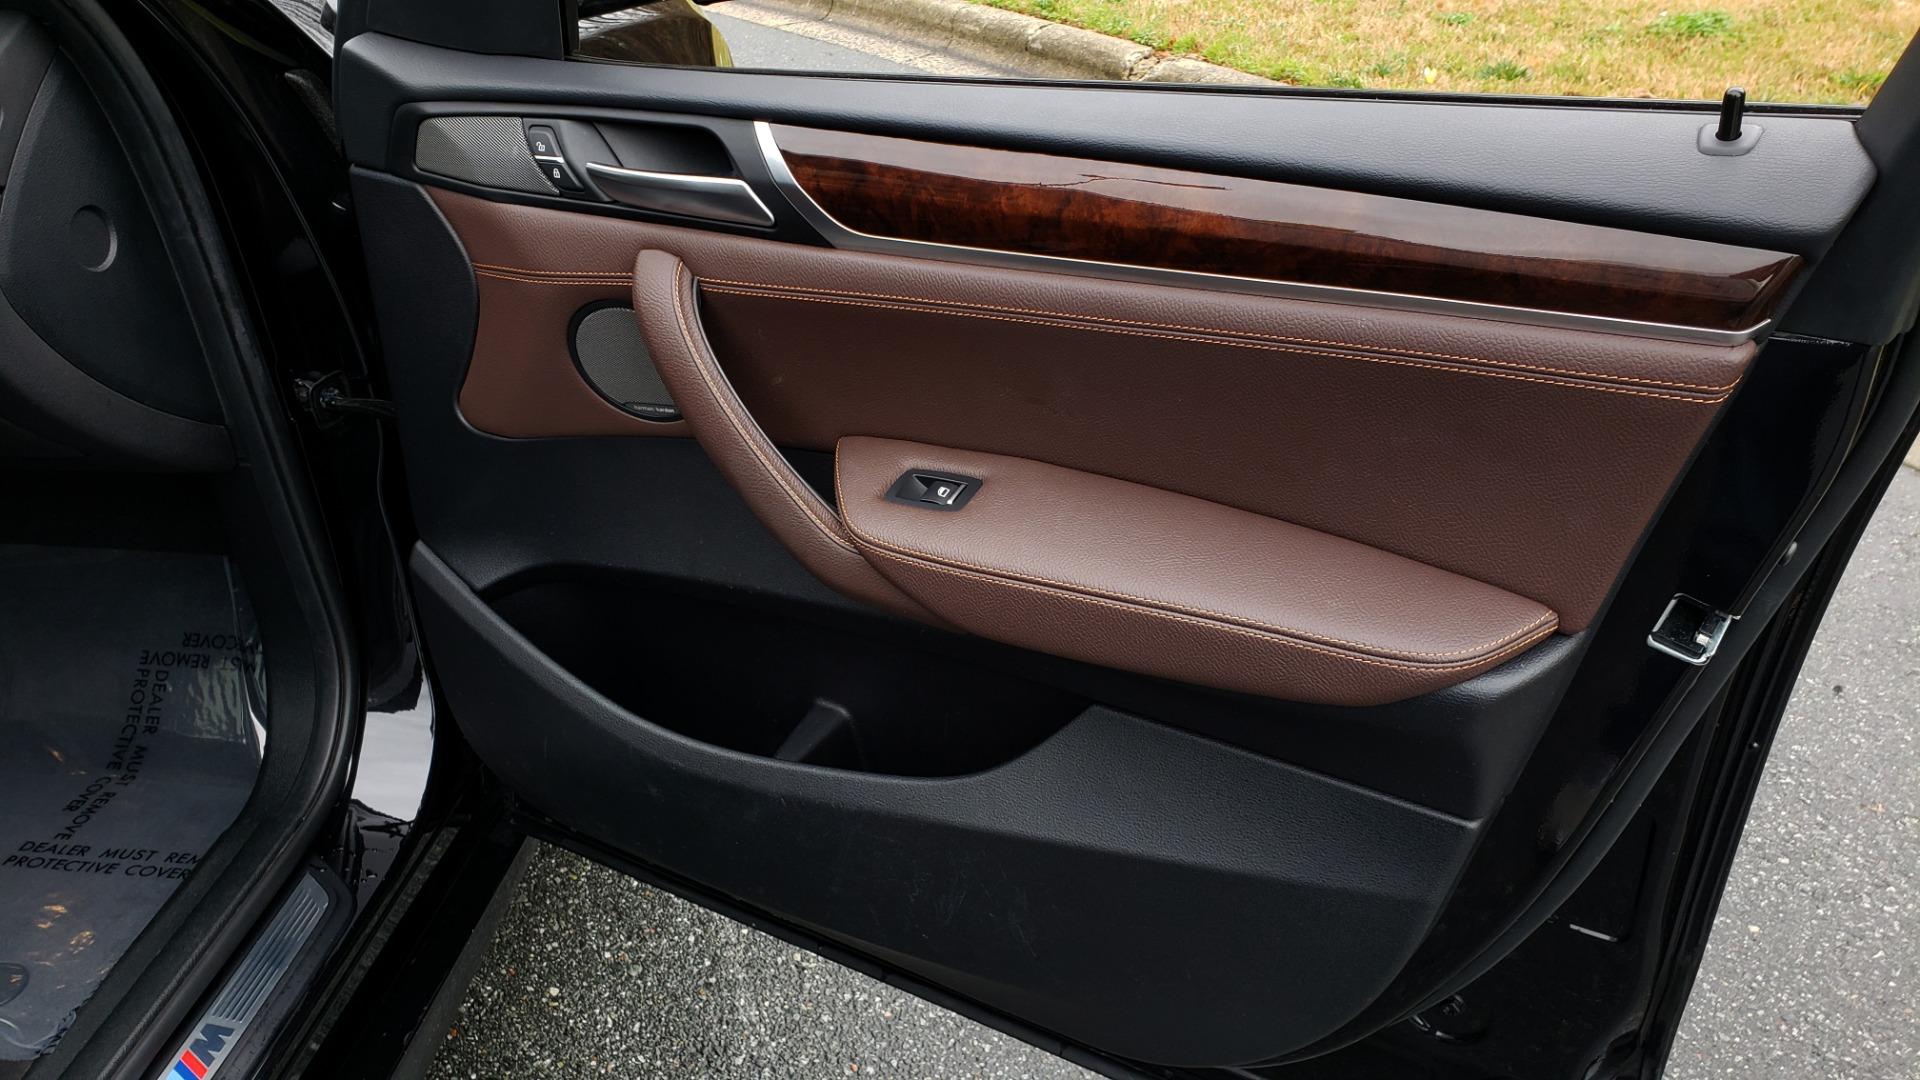 Used 2017 BMW X3 XDRIVE35I M-SPORT / DRVR ASST PLUS / TECHNOLOGY / HUD / BLIND SPOT for sale Sold at Formula Imports in Charlotte NC 28227 62